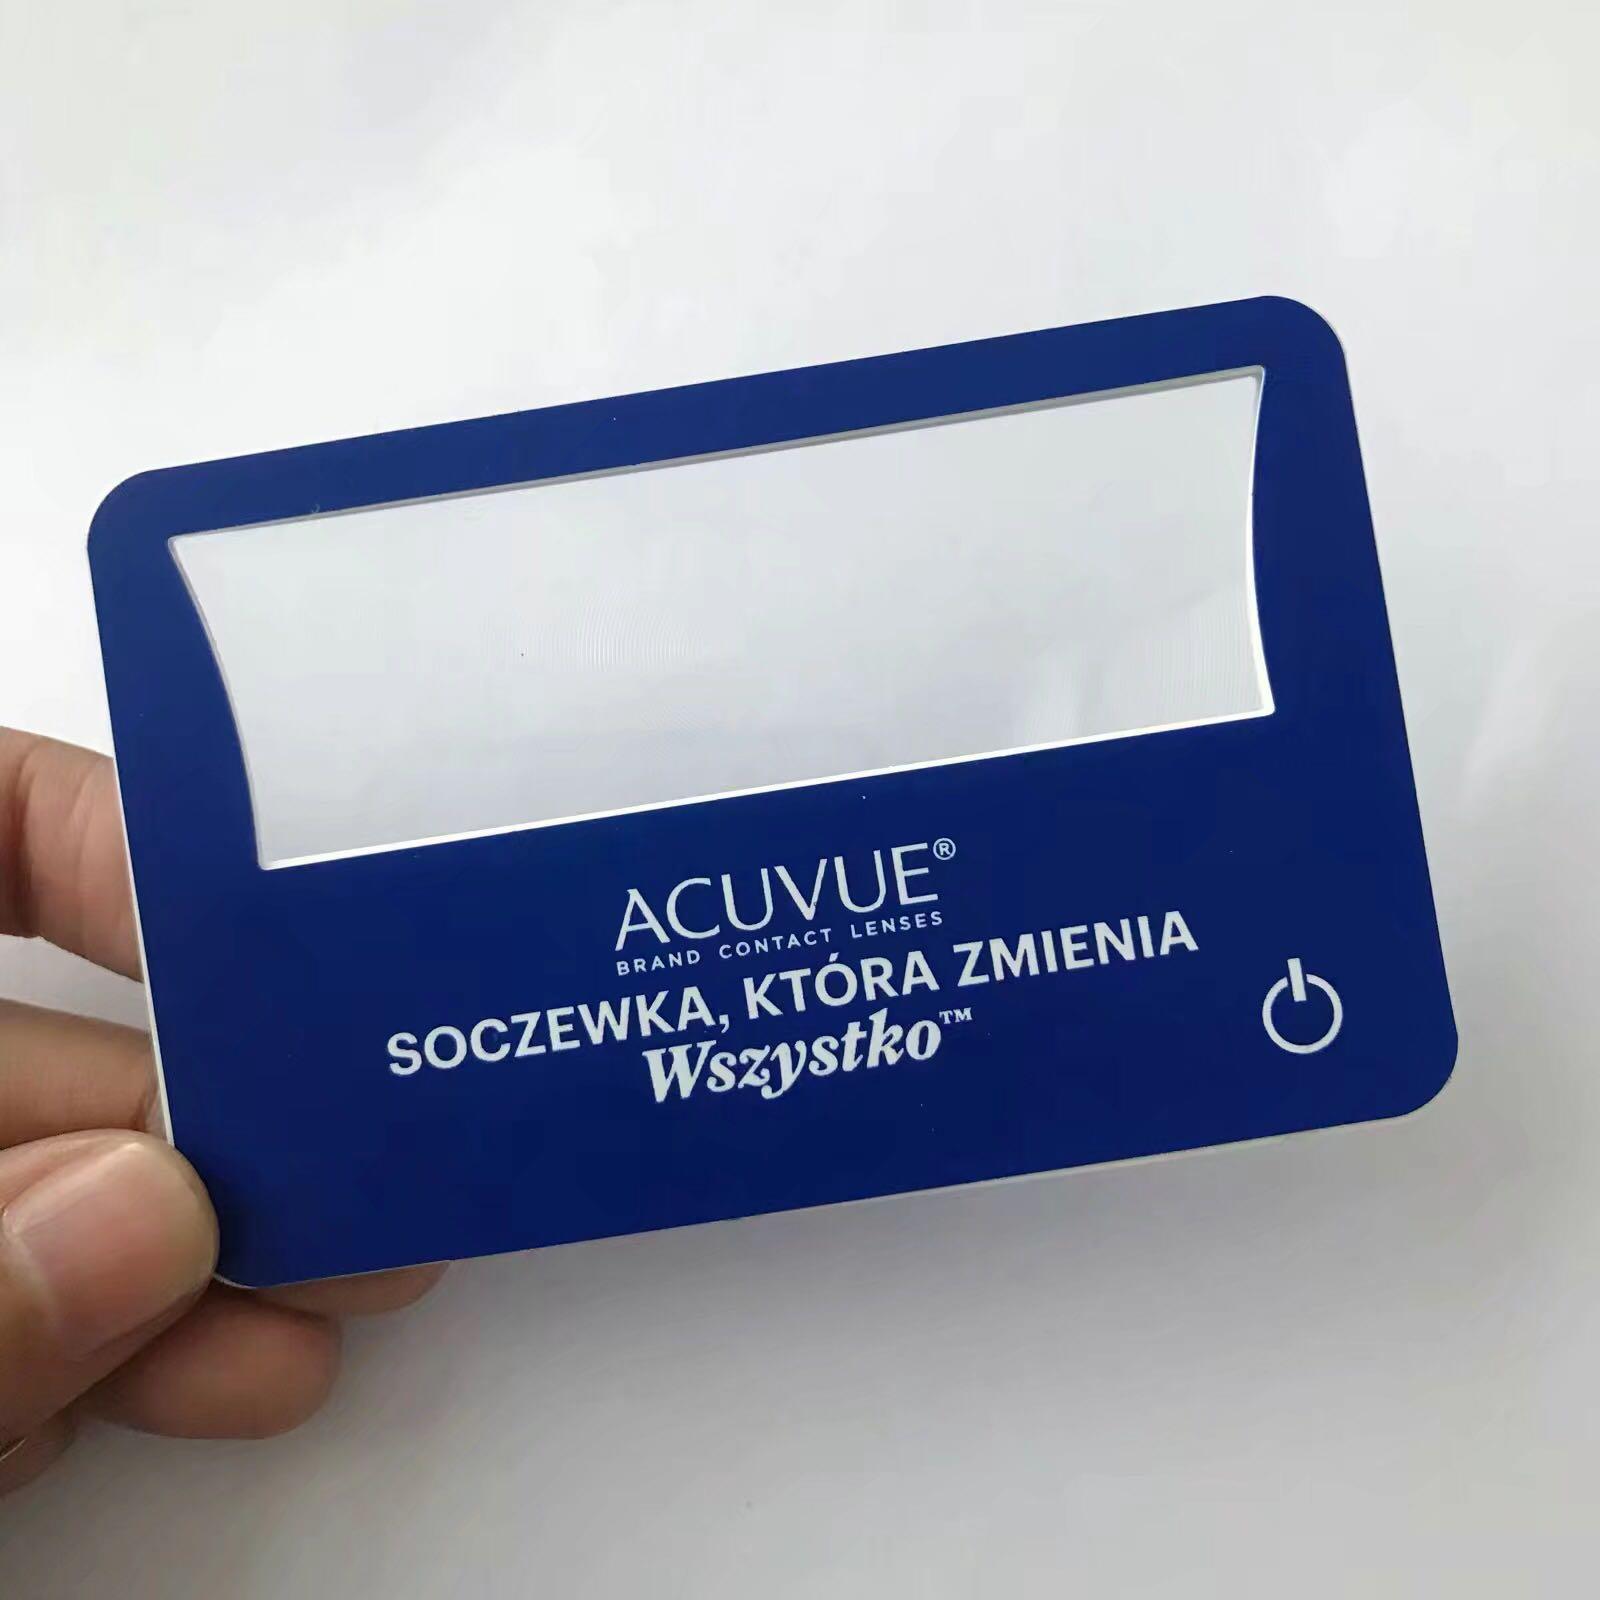 Credit Card Size Light LED Magnifier Magnifier with LED light